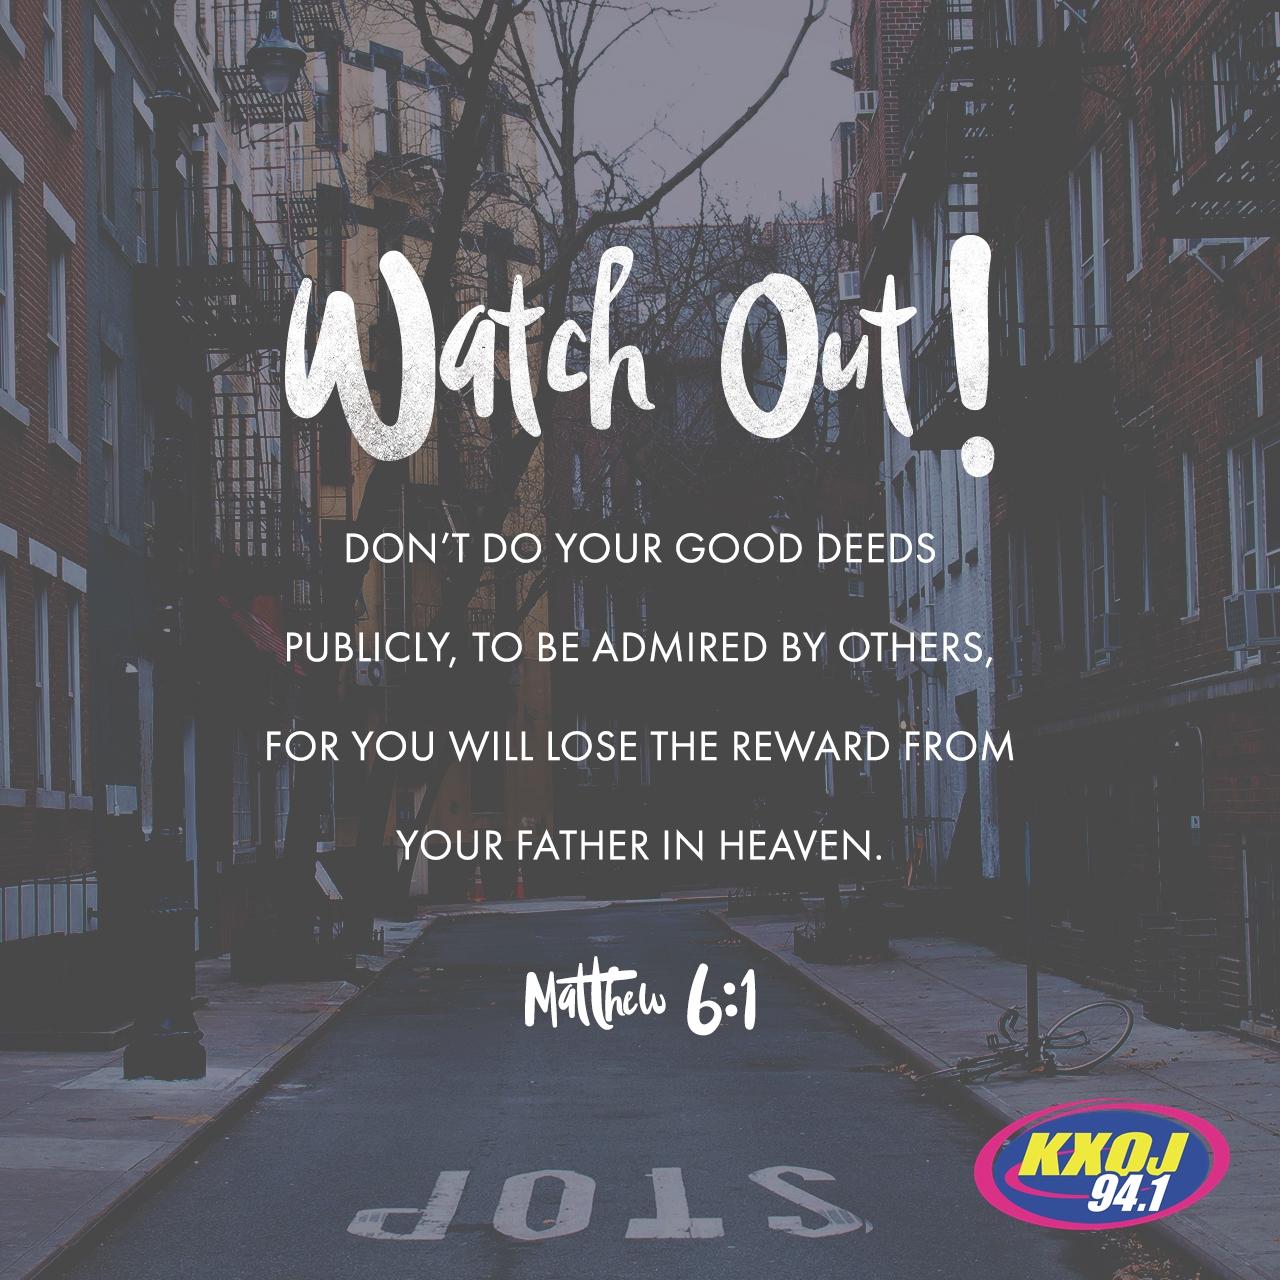 June 5th - Matthew 6:1